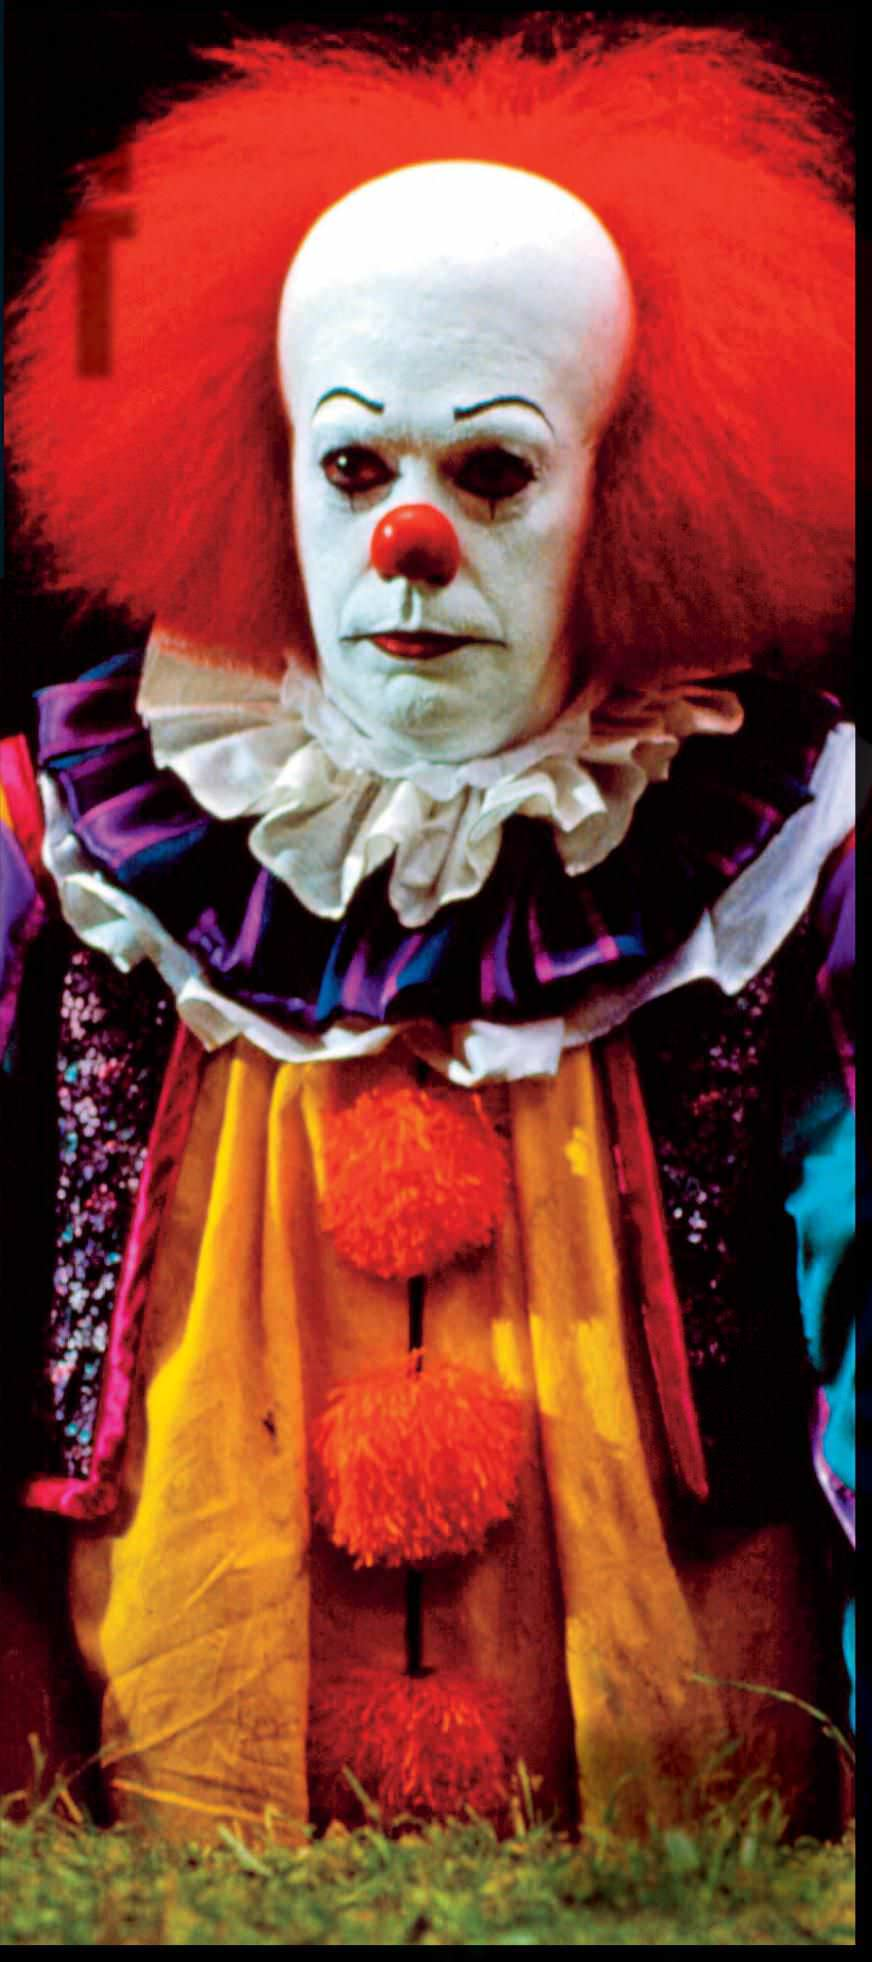 Creepy Clown Rampage Ain't Very Funny!